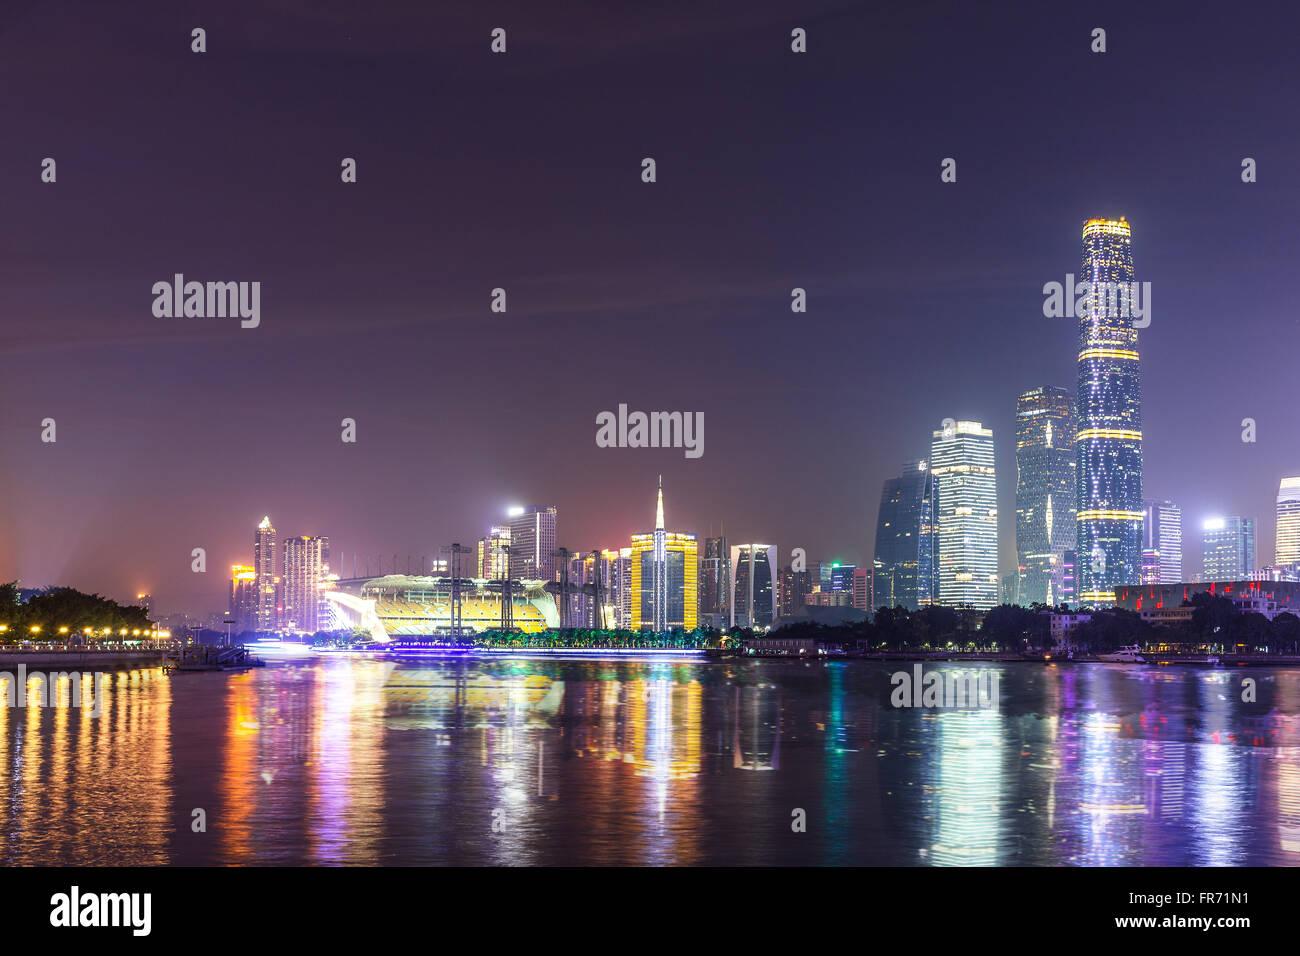 City, night, Guangzhou, Asia tower, CBD, unmanned, horizontal, Pearl River, Haixinsha, modern buildings, landmarks, - Stock Image